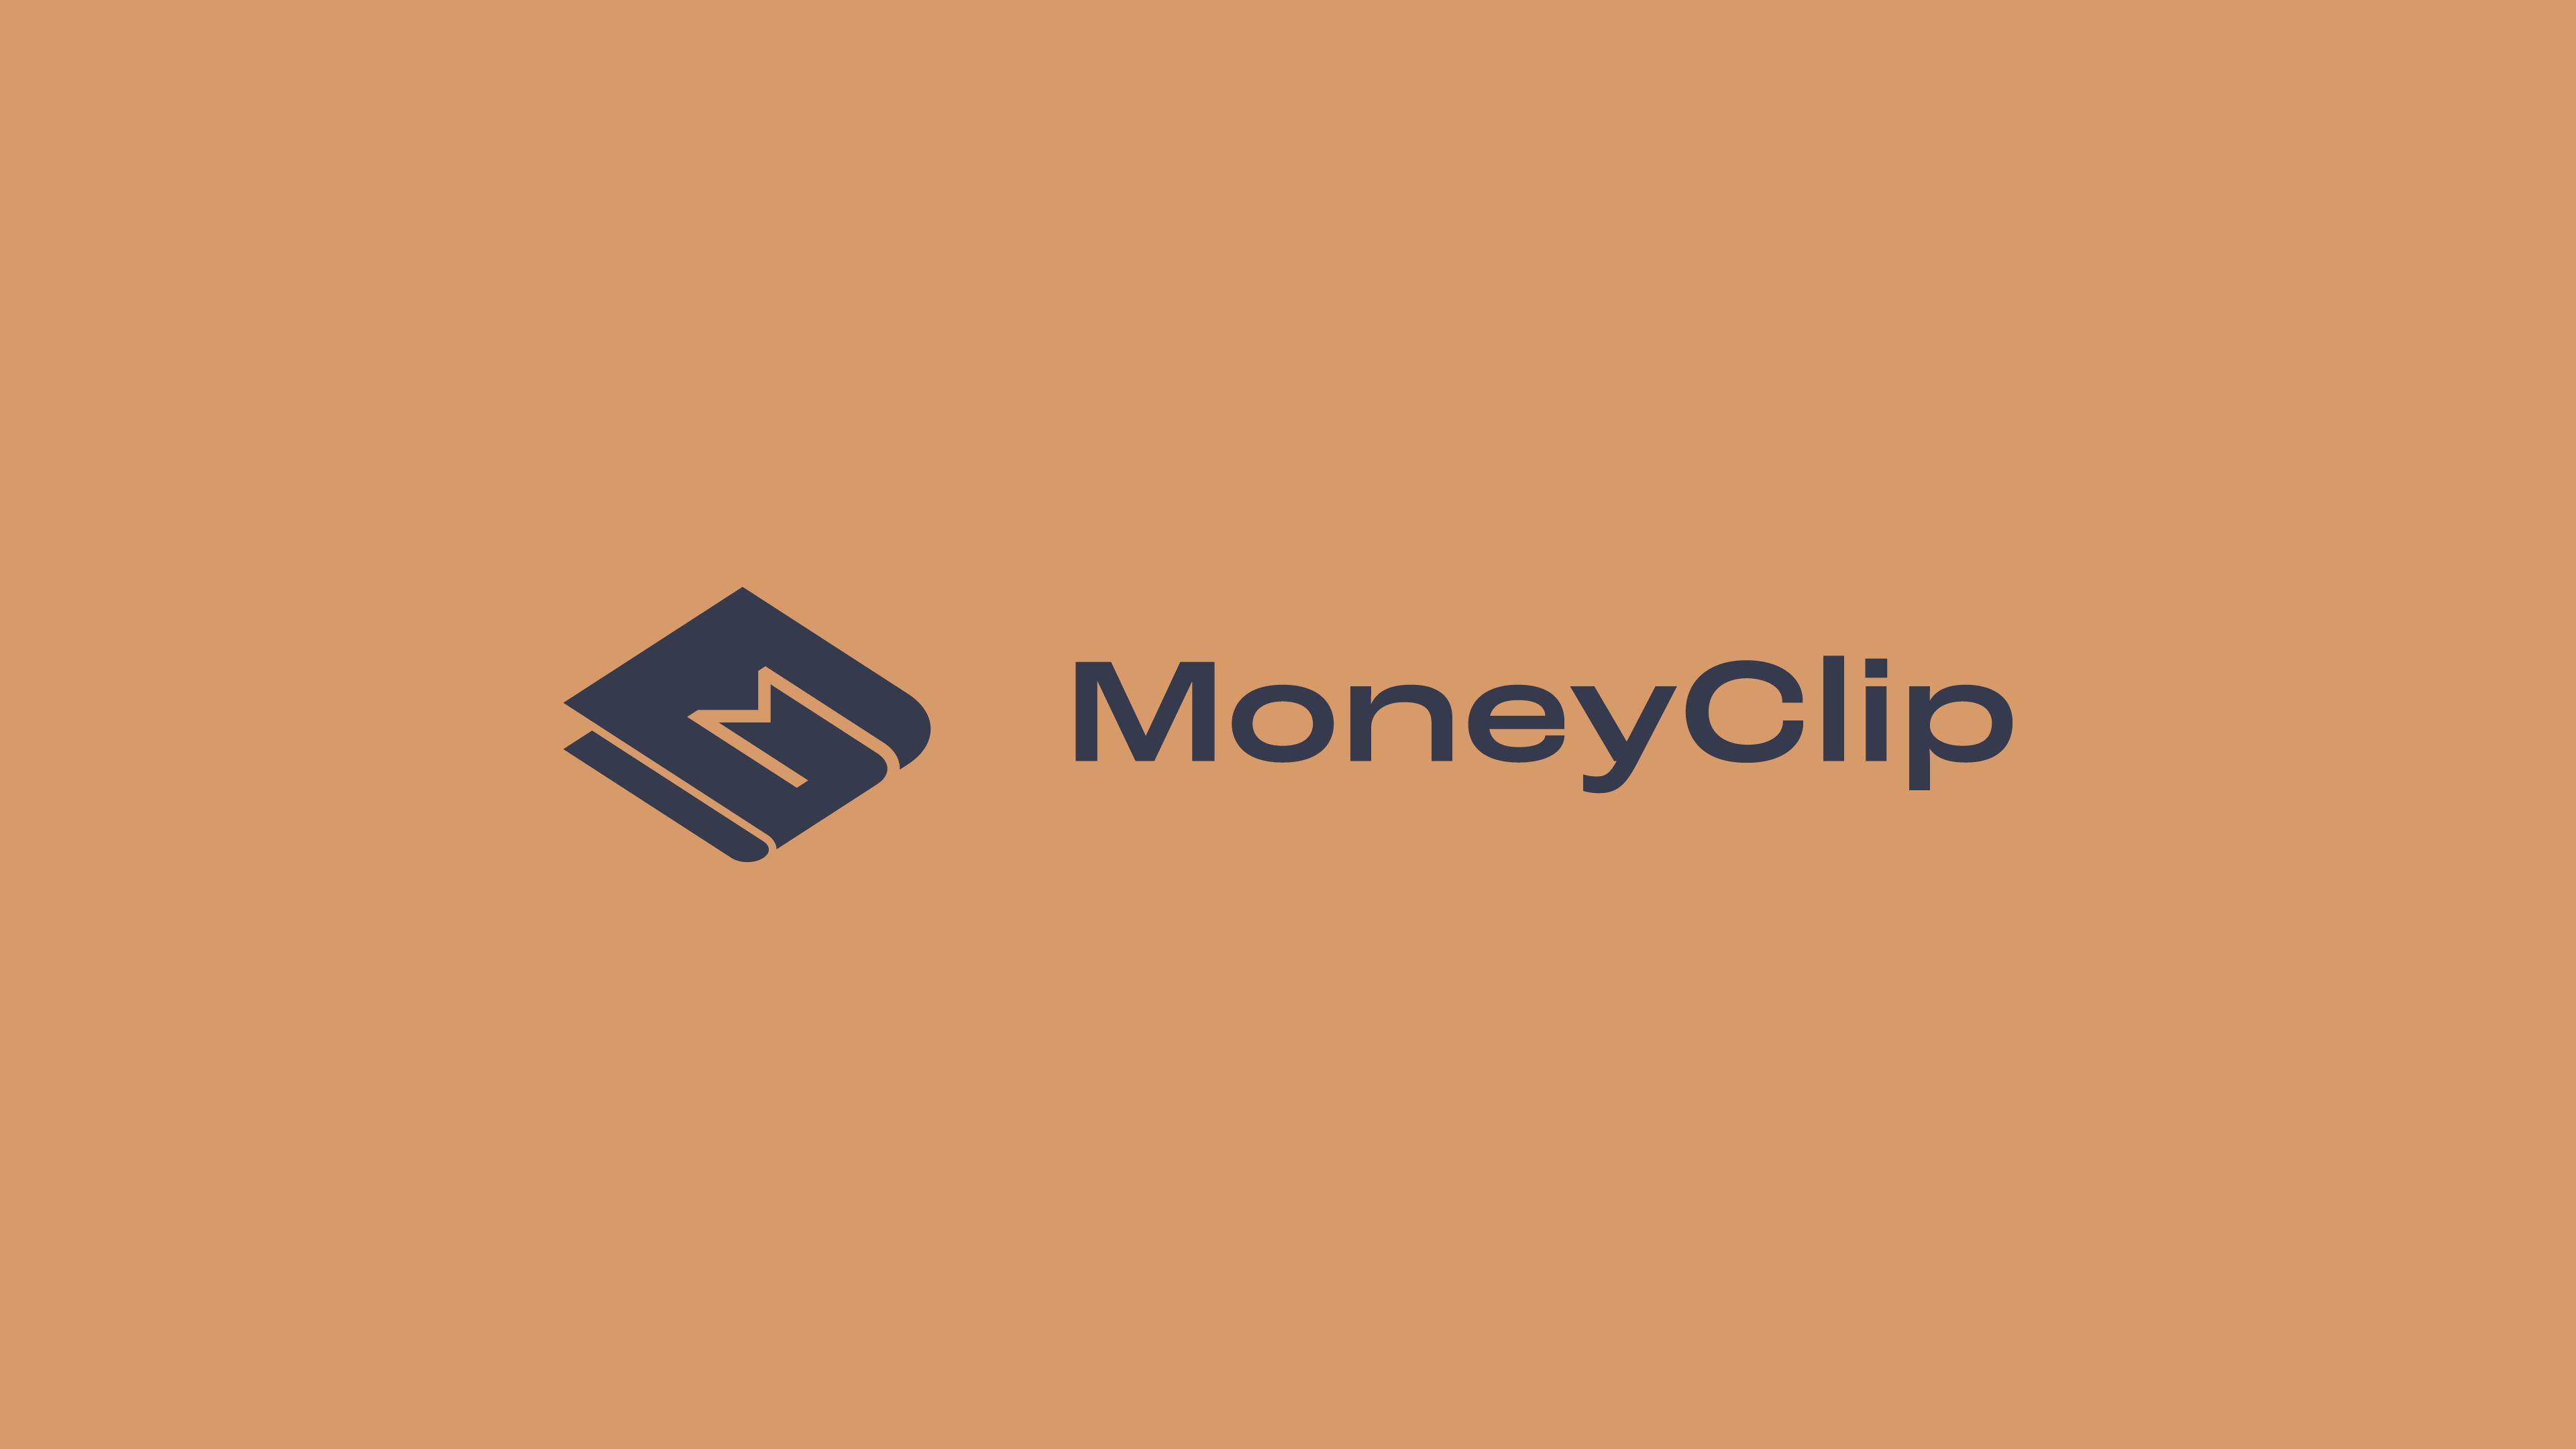 moneyclip-secondary-logo-c